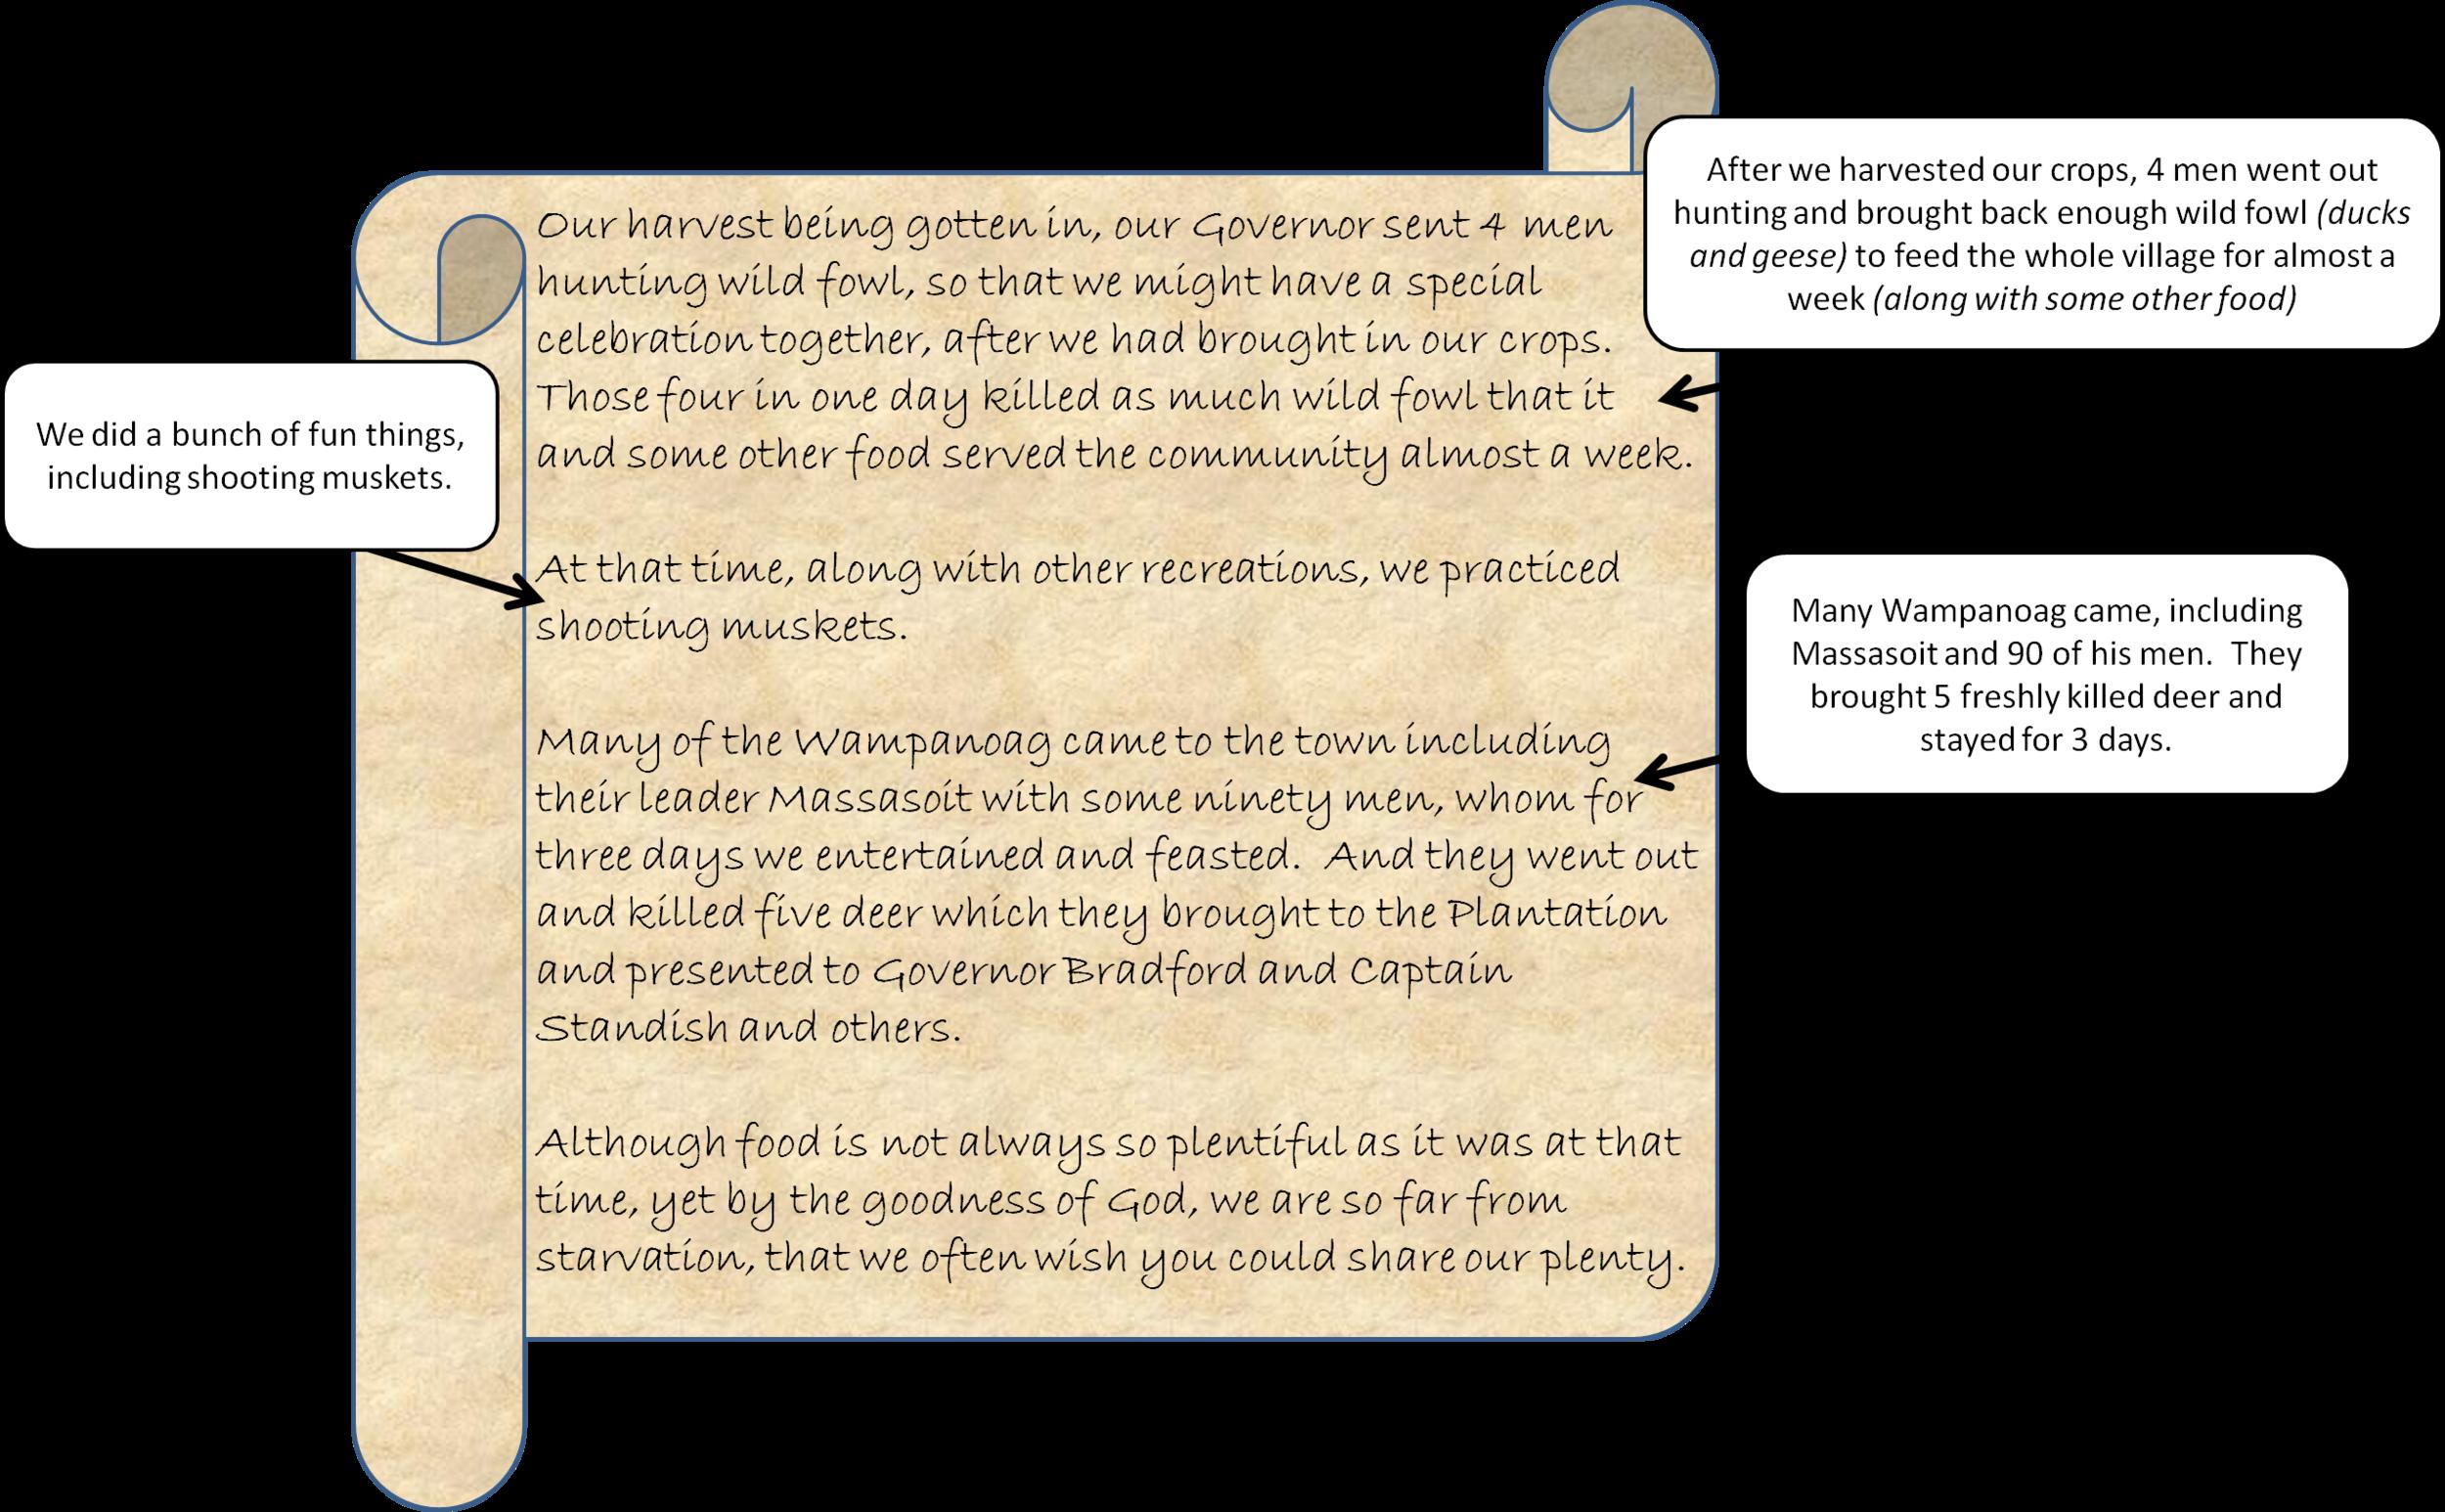 Modernized English provided by the Plimoth Plantation ( www.plimoth.org ).